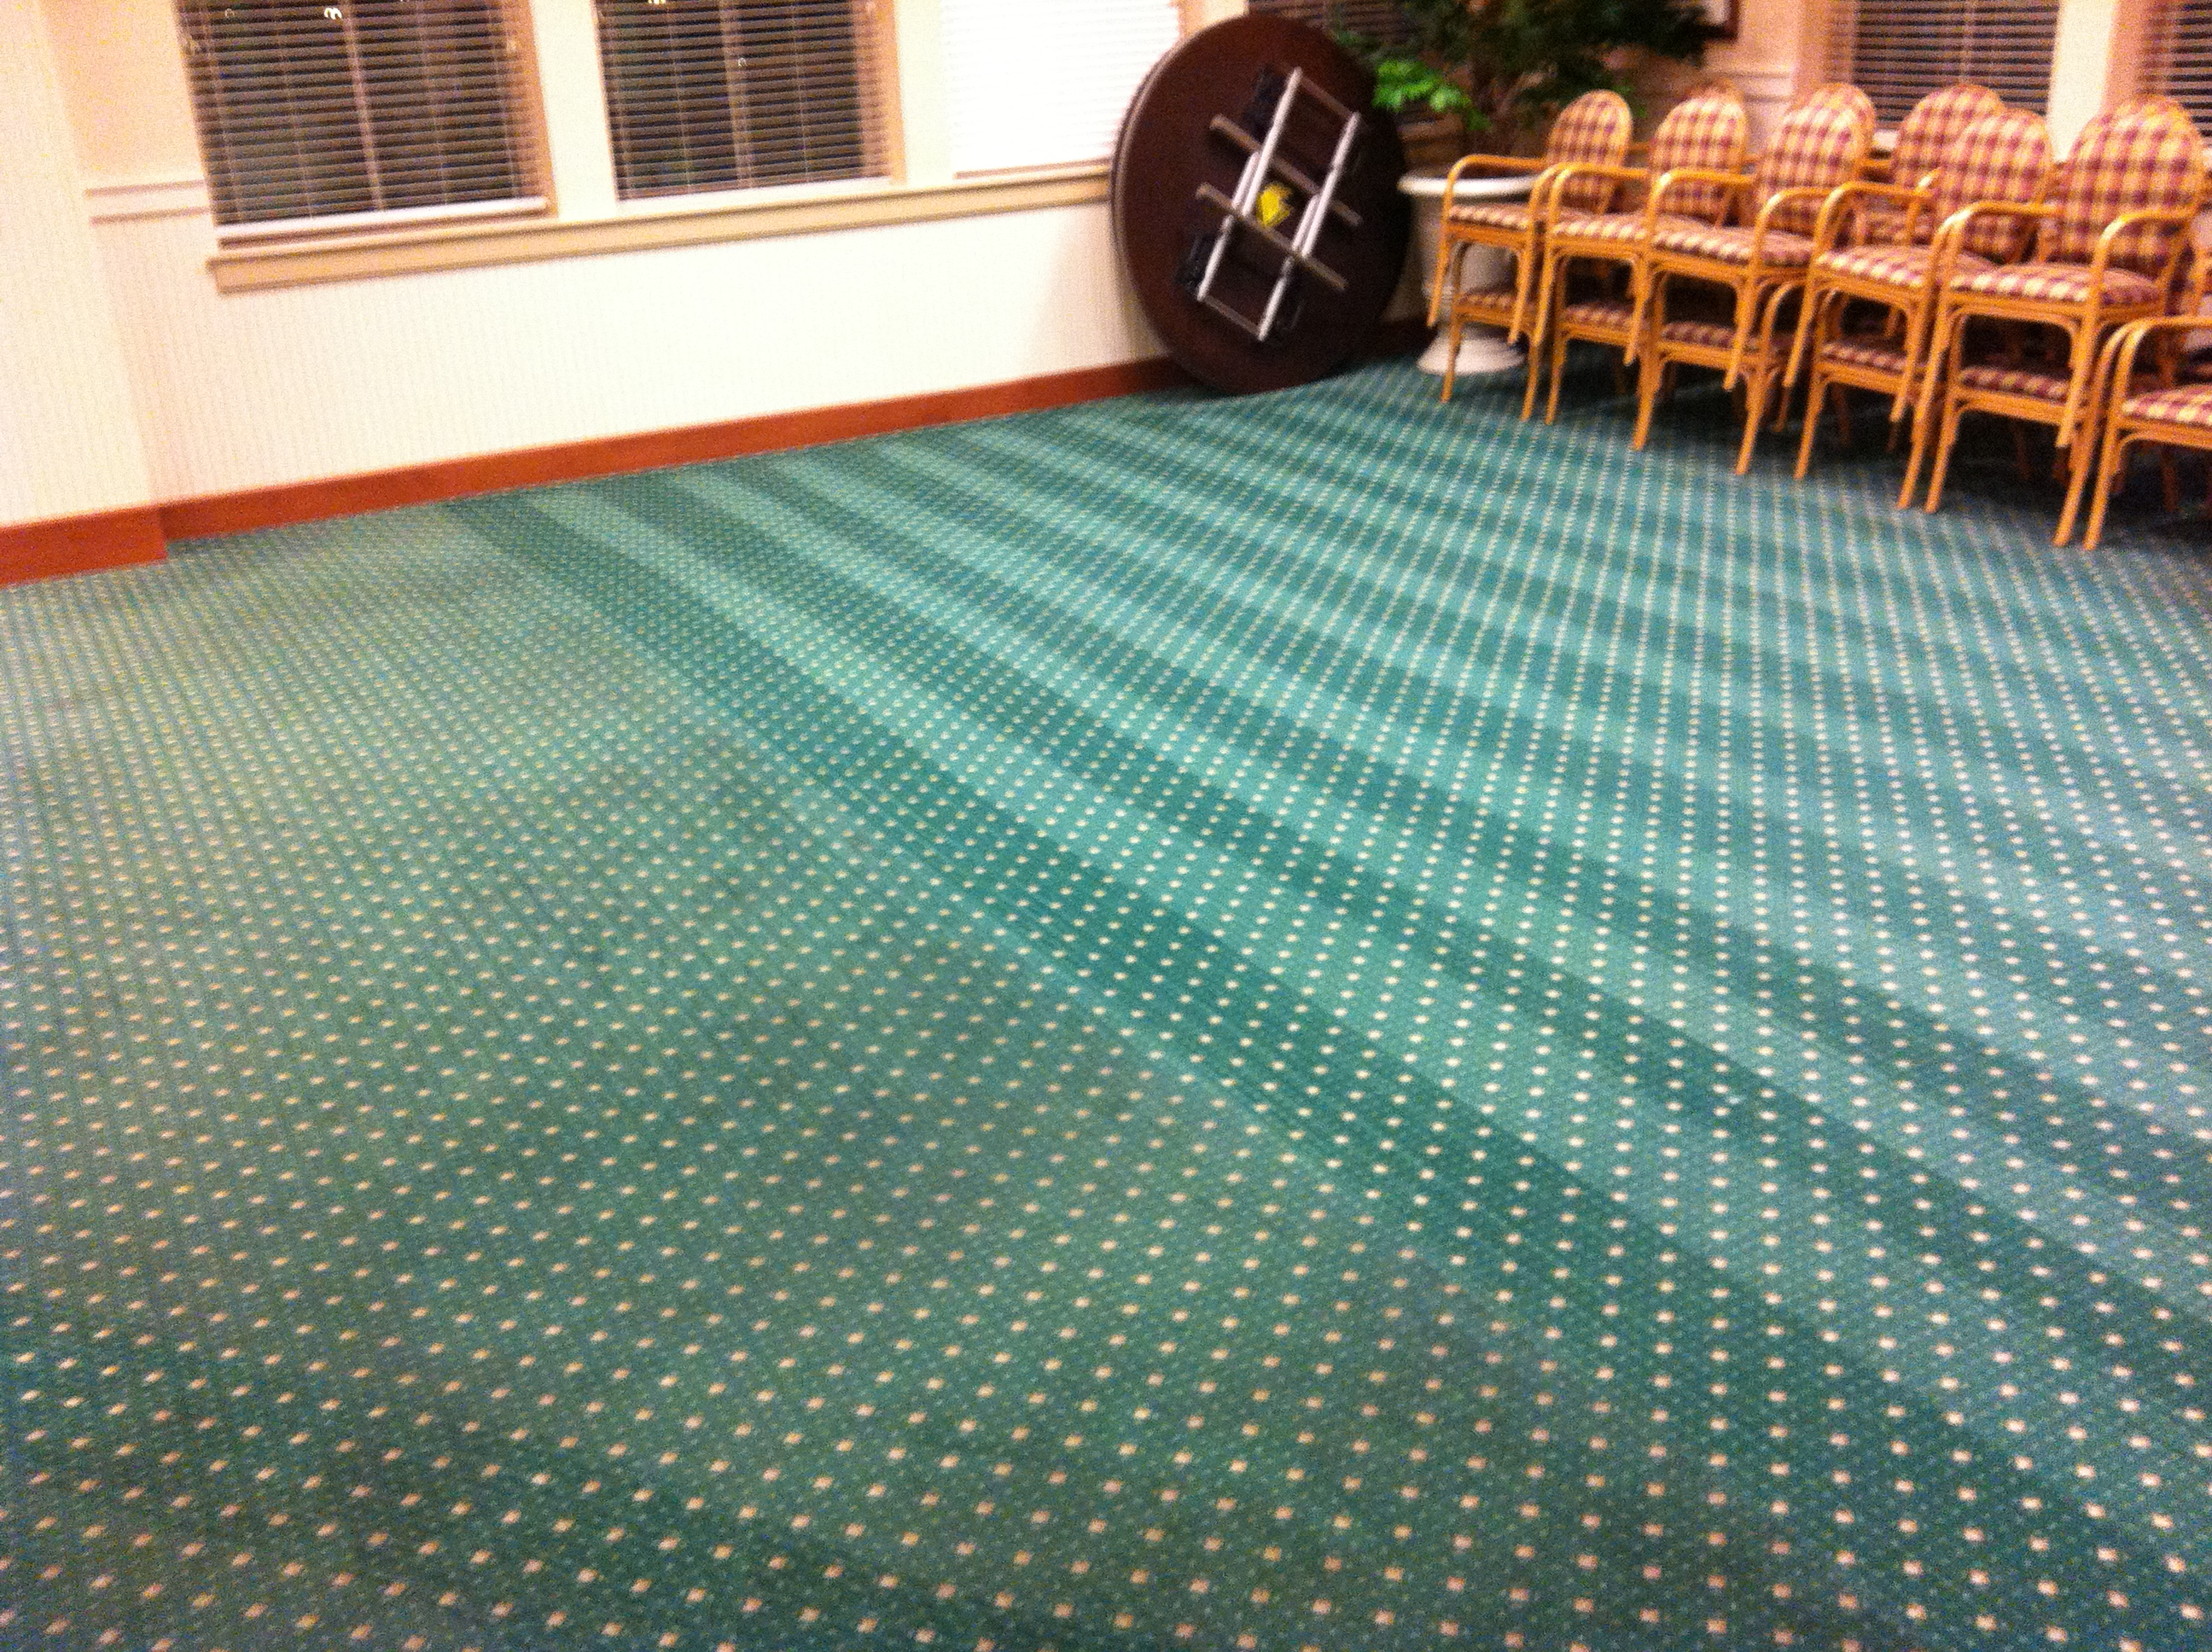 chem dry vs steam cleaning carpets floor matttroy. Black Bedroom Furniture Sets. Home Design Ideas